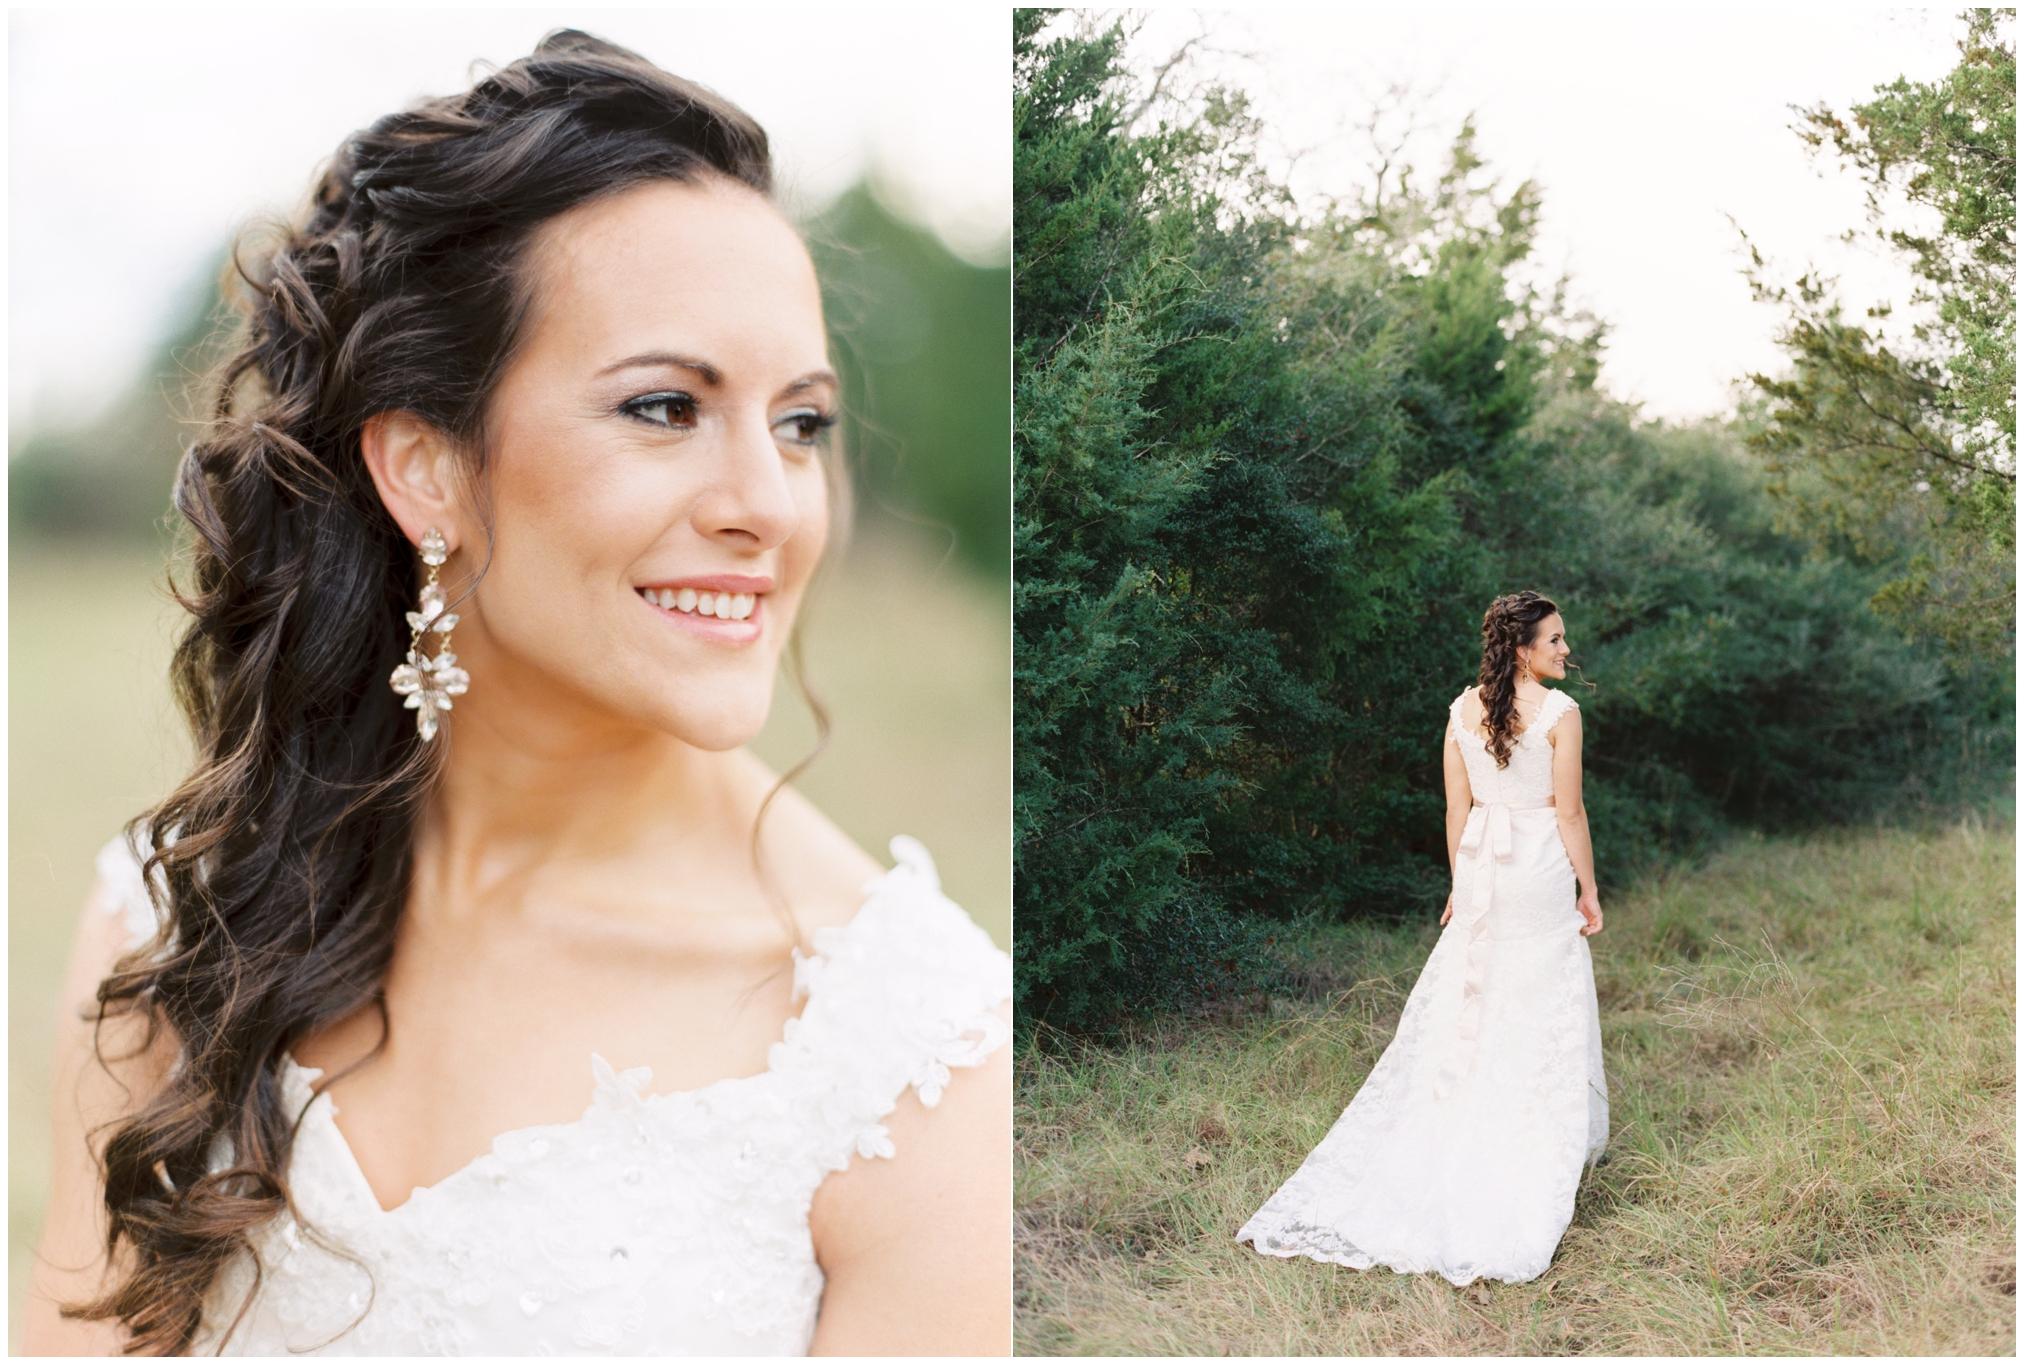 Sarah Best Photography - Emily's Bridals-110_STP.jpg